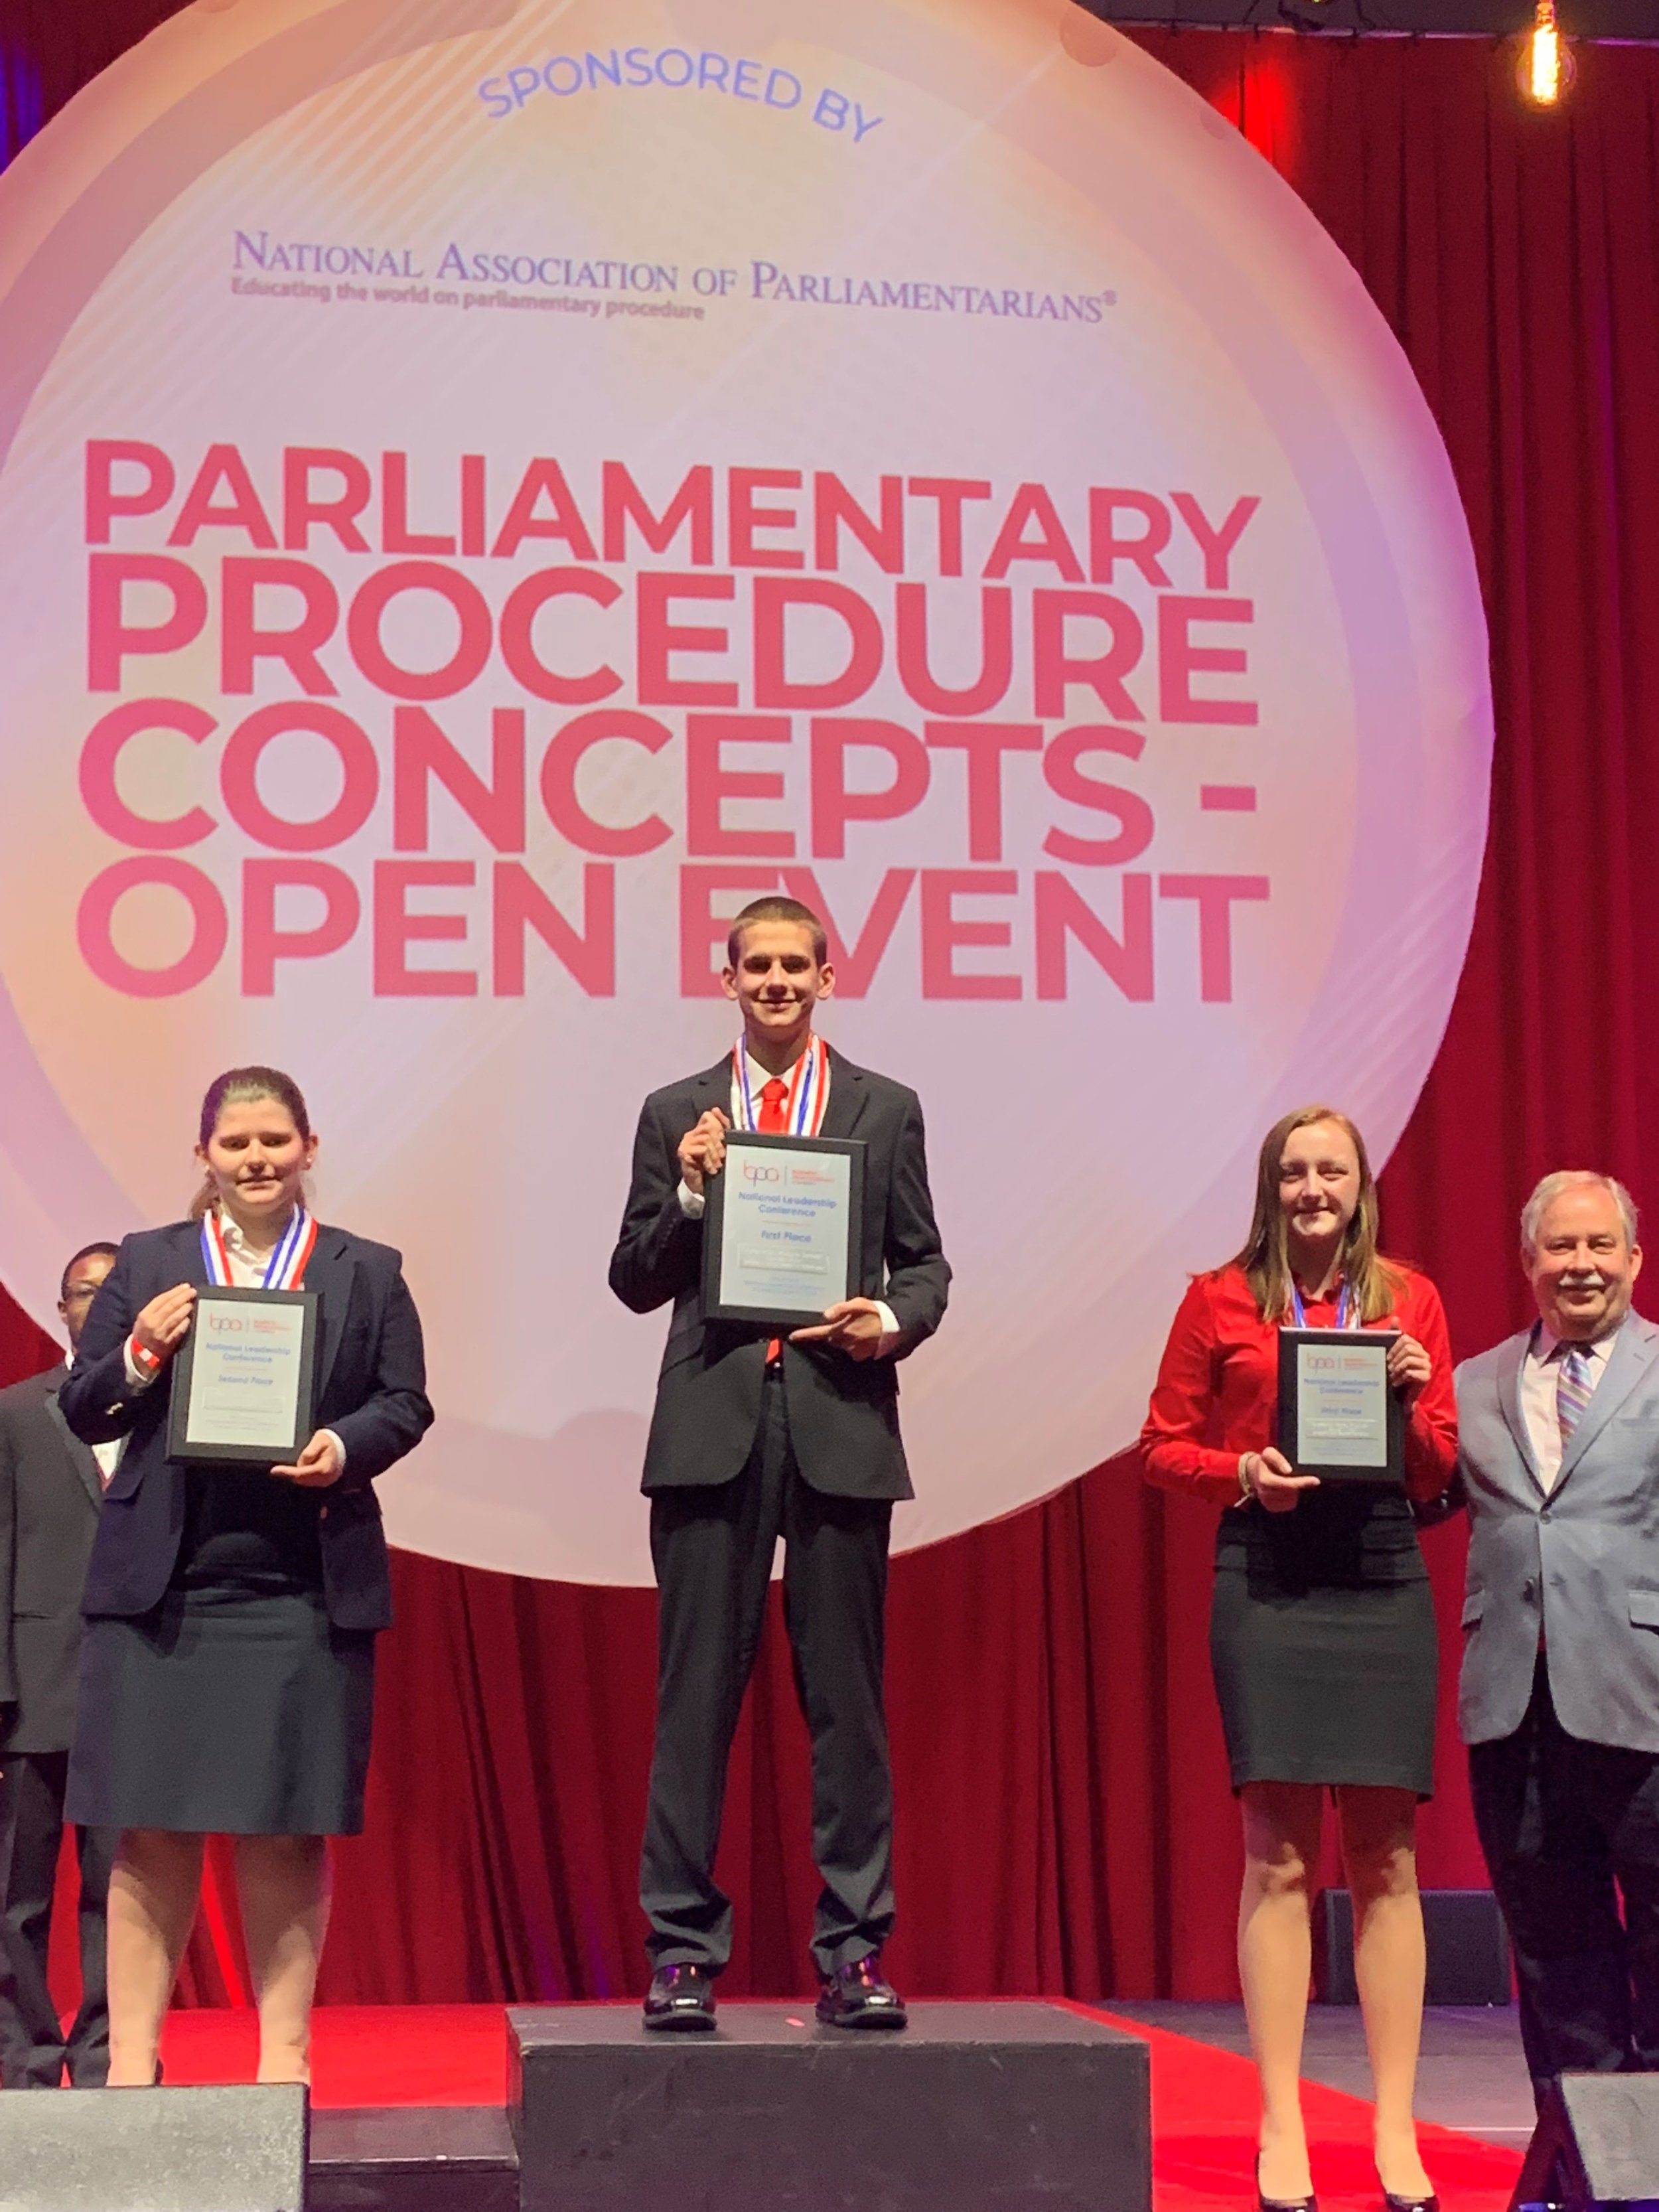 Parliamentary Procedure Concepts (S) - Trent Cappaert (1st place, center), Paige Cappaert (3rd place, left) (2019 NLC)